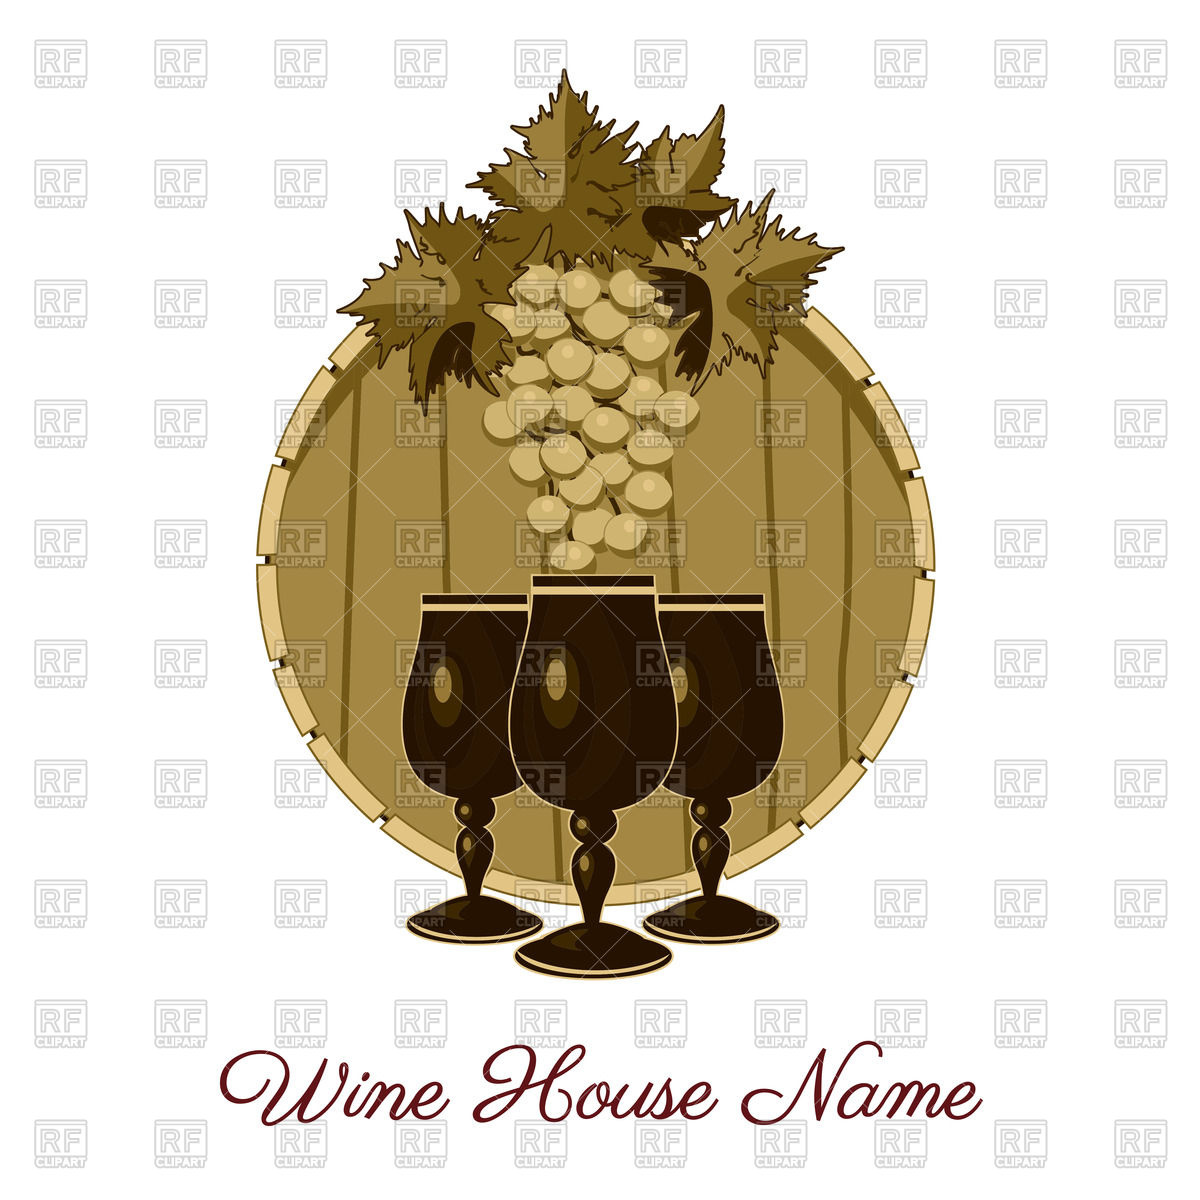 Wine house or vineyard emblem.